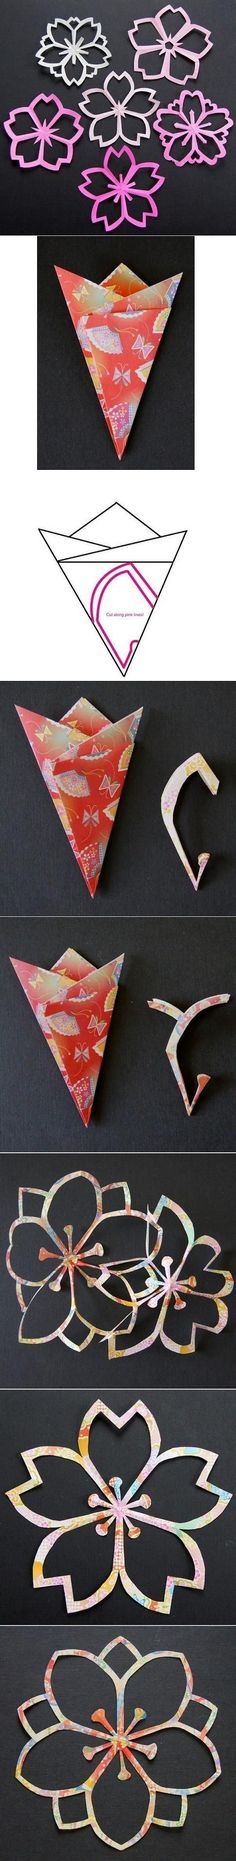 DIY Flower Paper Cutting: